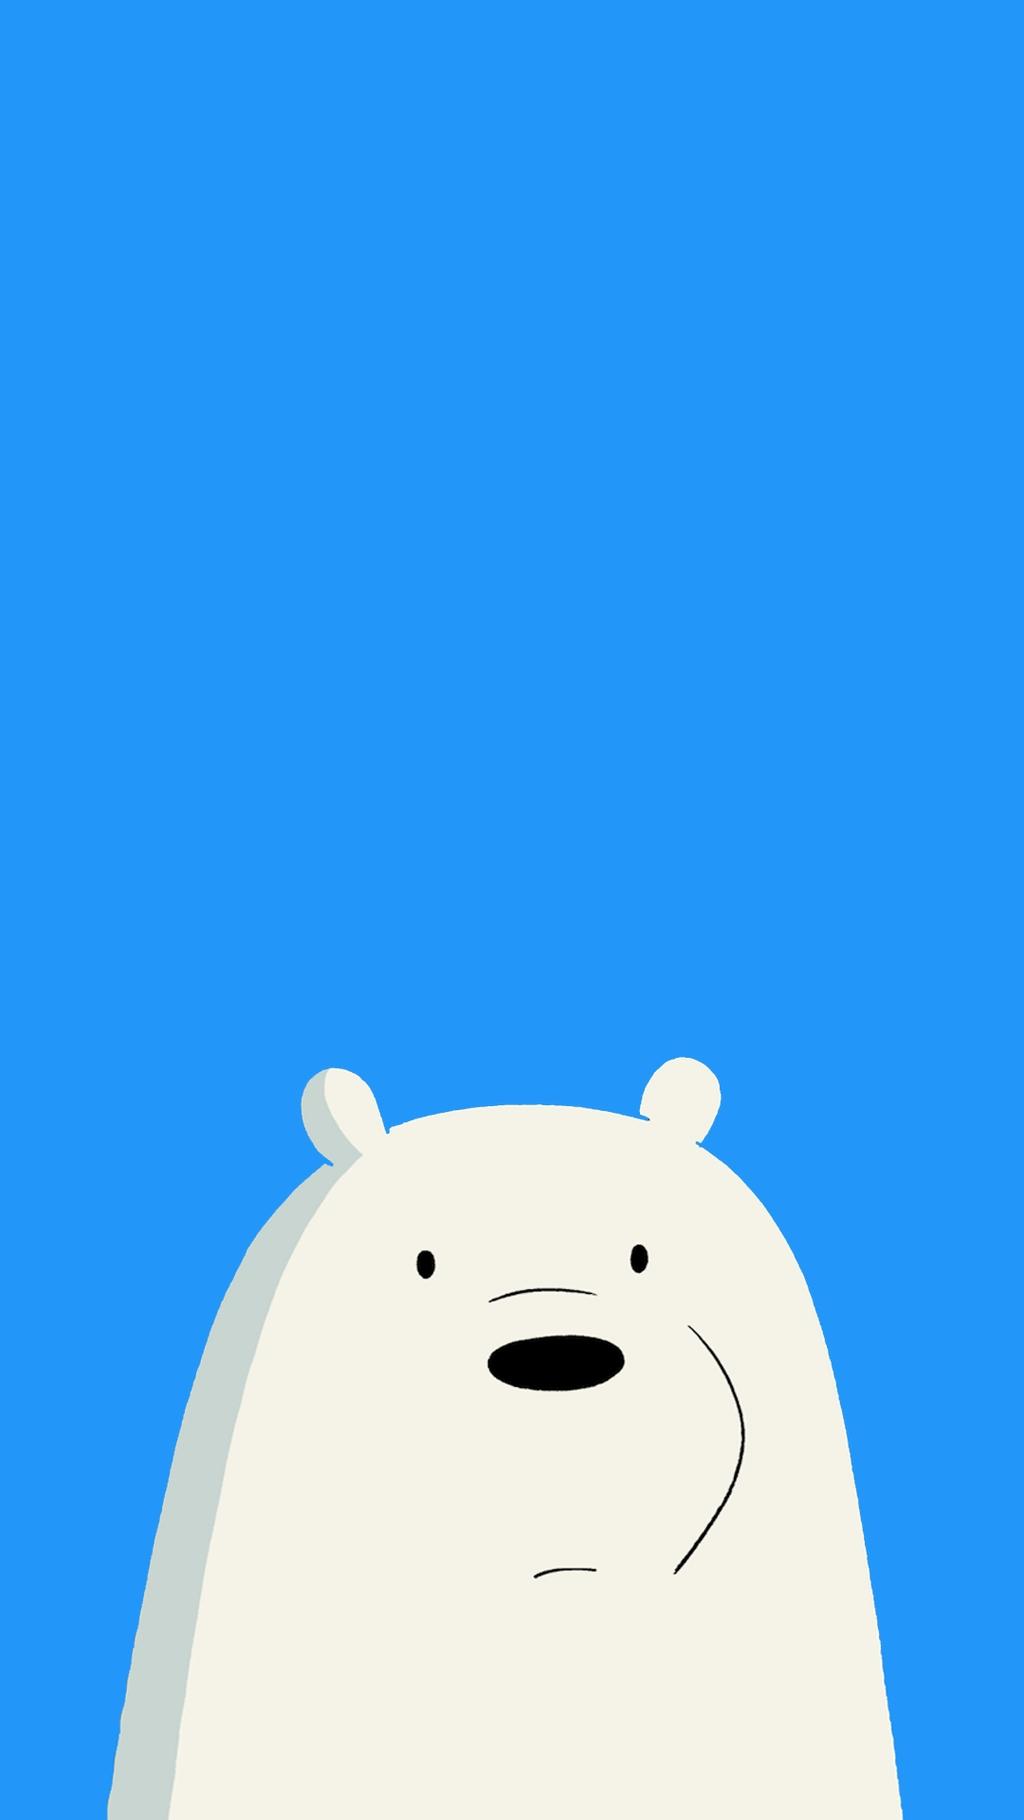 pinynnhi on ynnh | pinterest | bare bears, wallpaper and